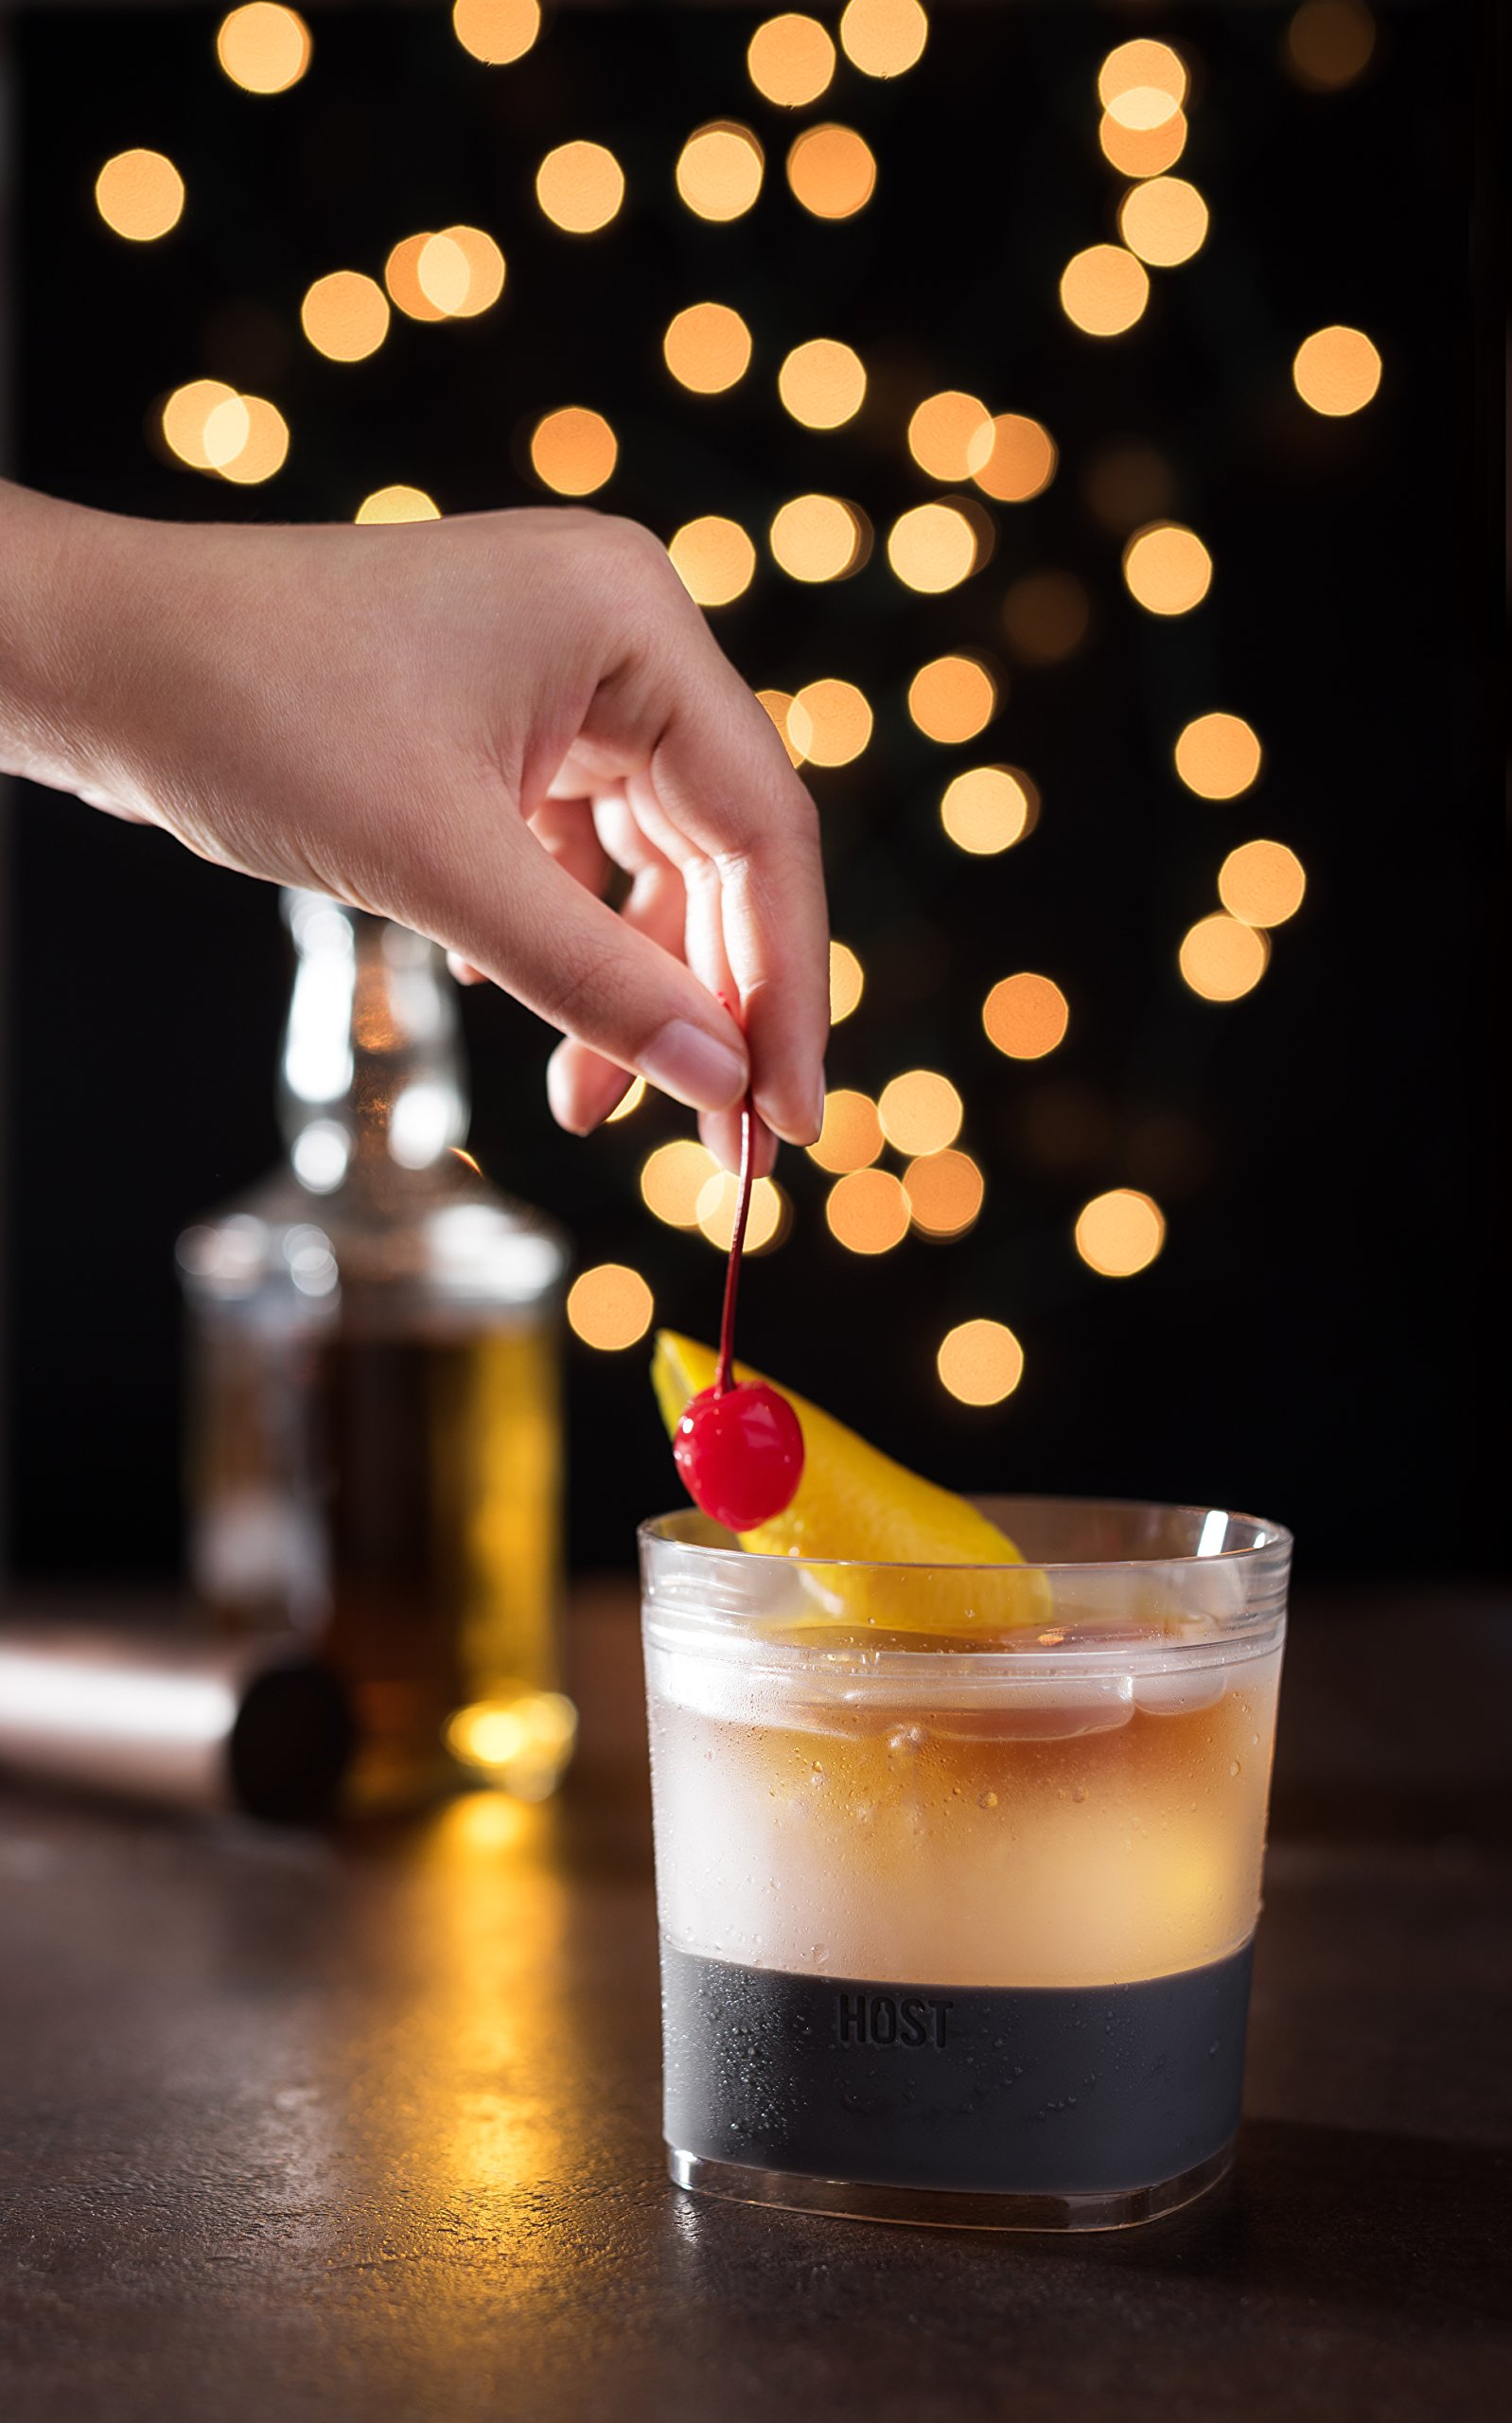 HOST Freeze Whiskey Set by HOST